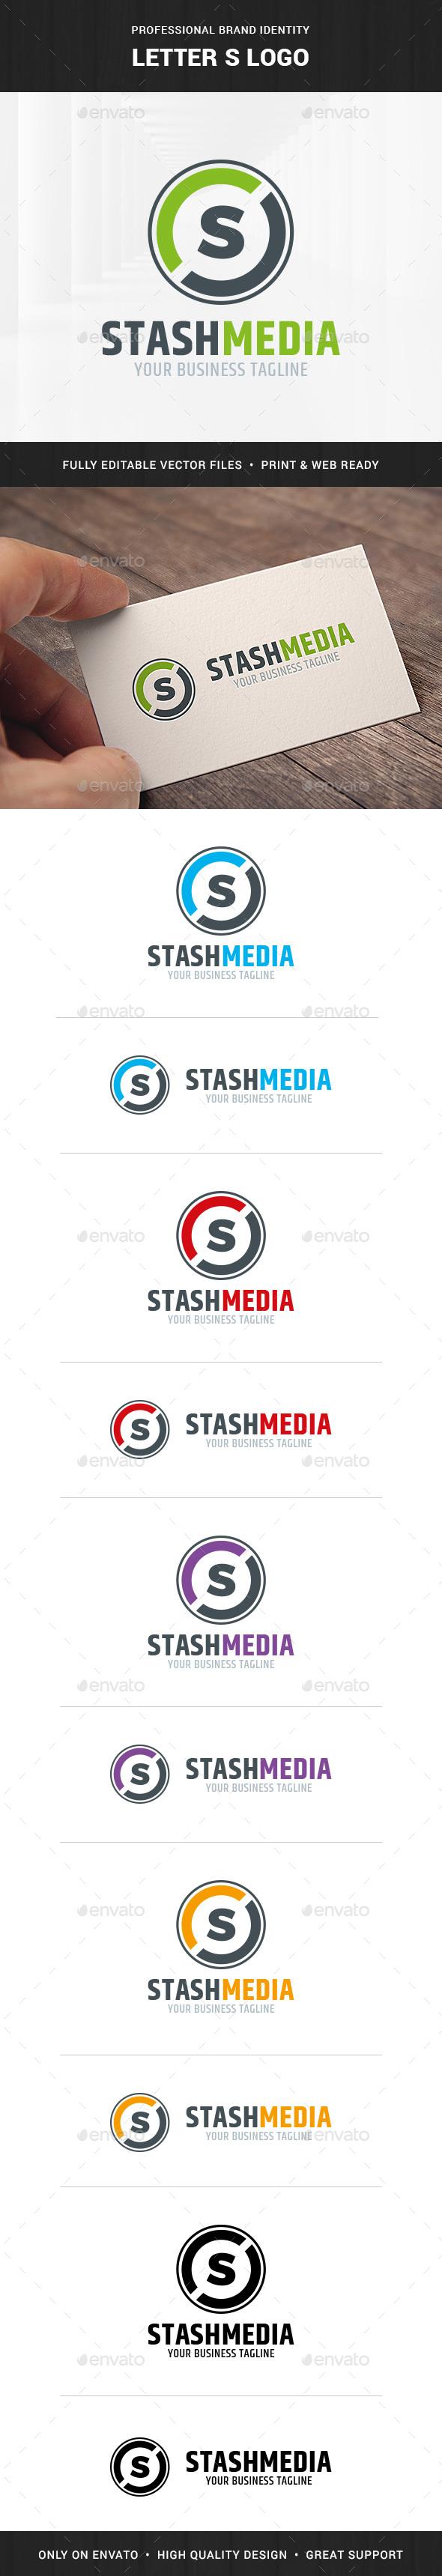 Letter S Logo Template - Letters Logo Templates